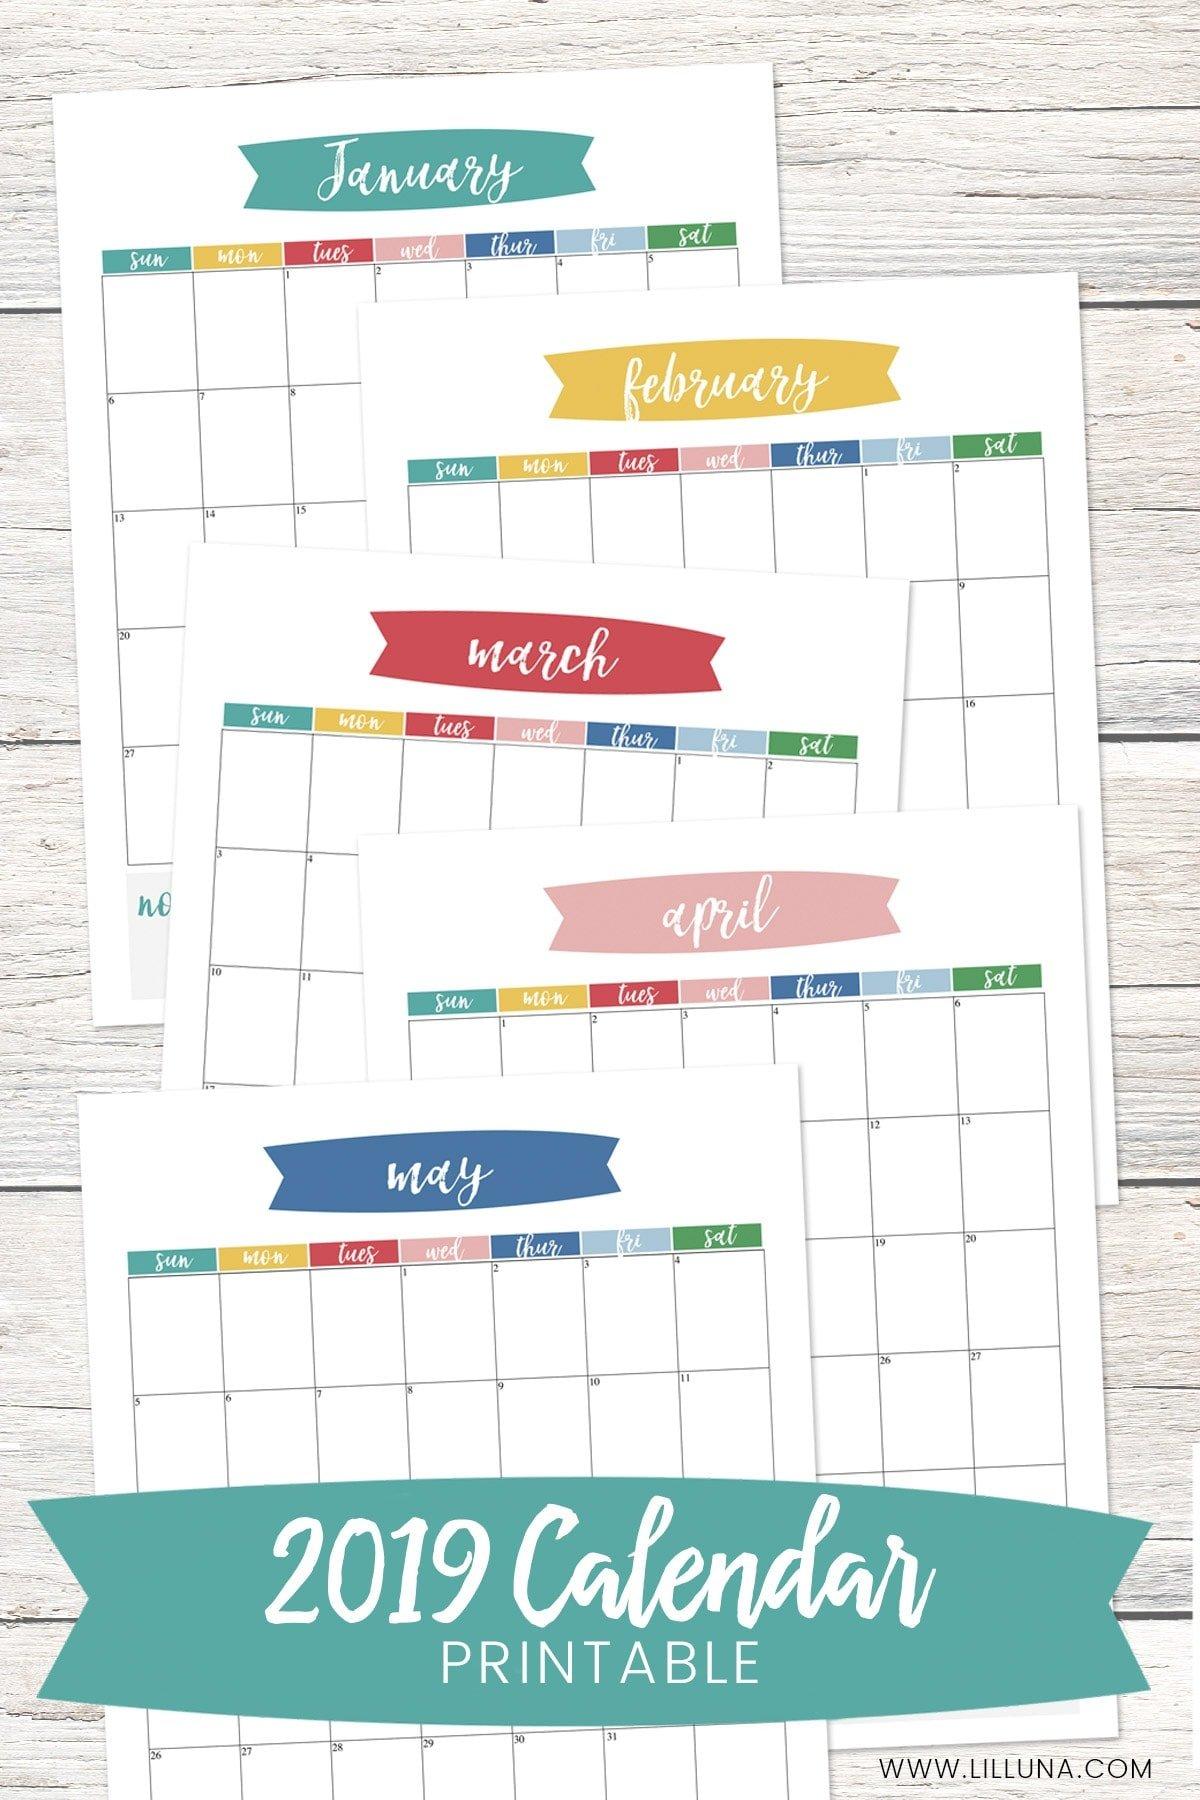 Free 2019 Calendar Printable + Blank Calendar | Lil' Luna Calendars That You Can Fill In